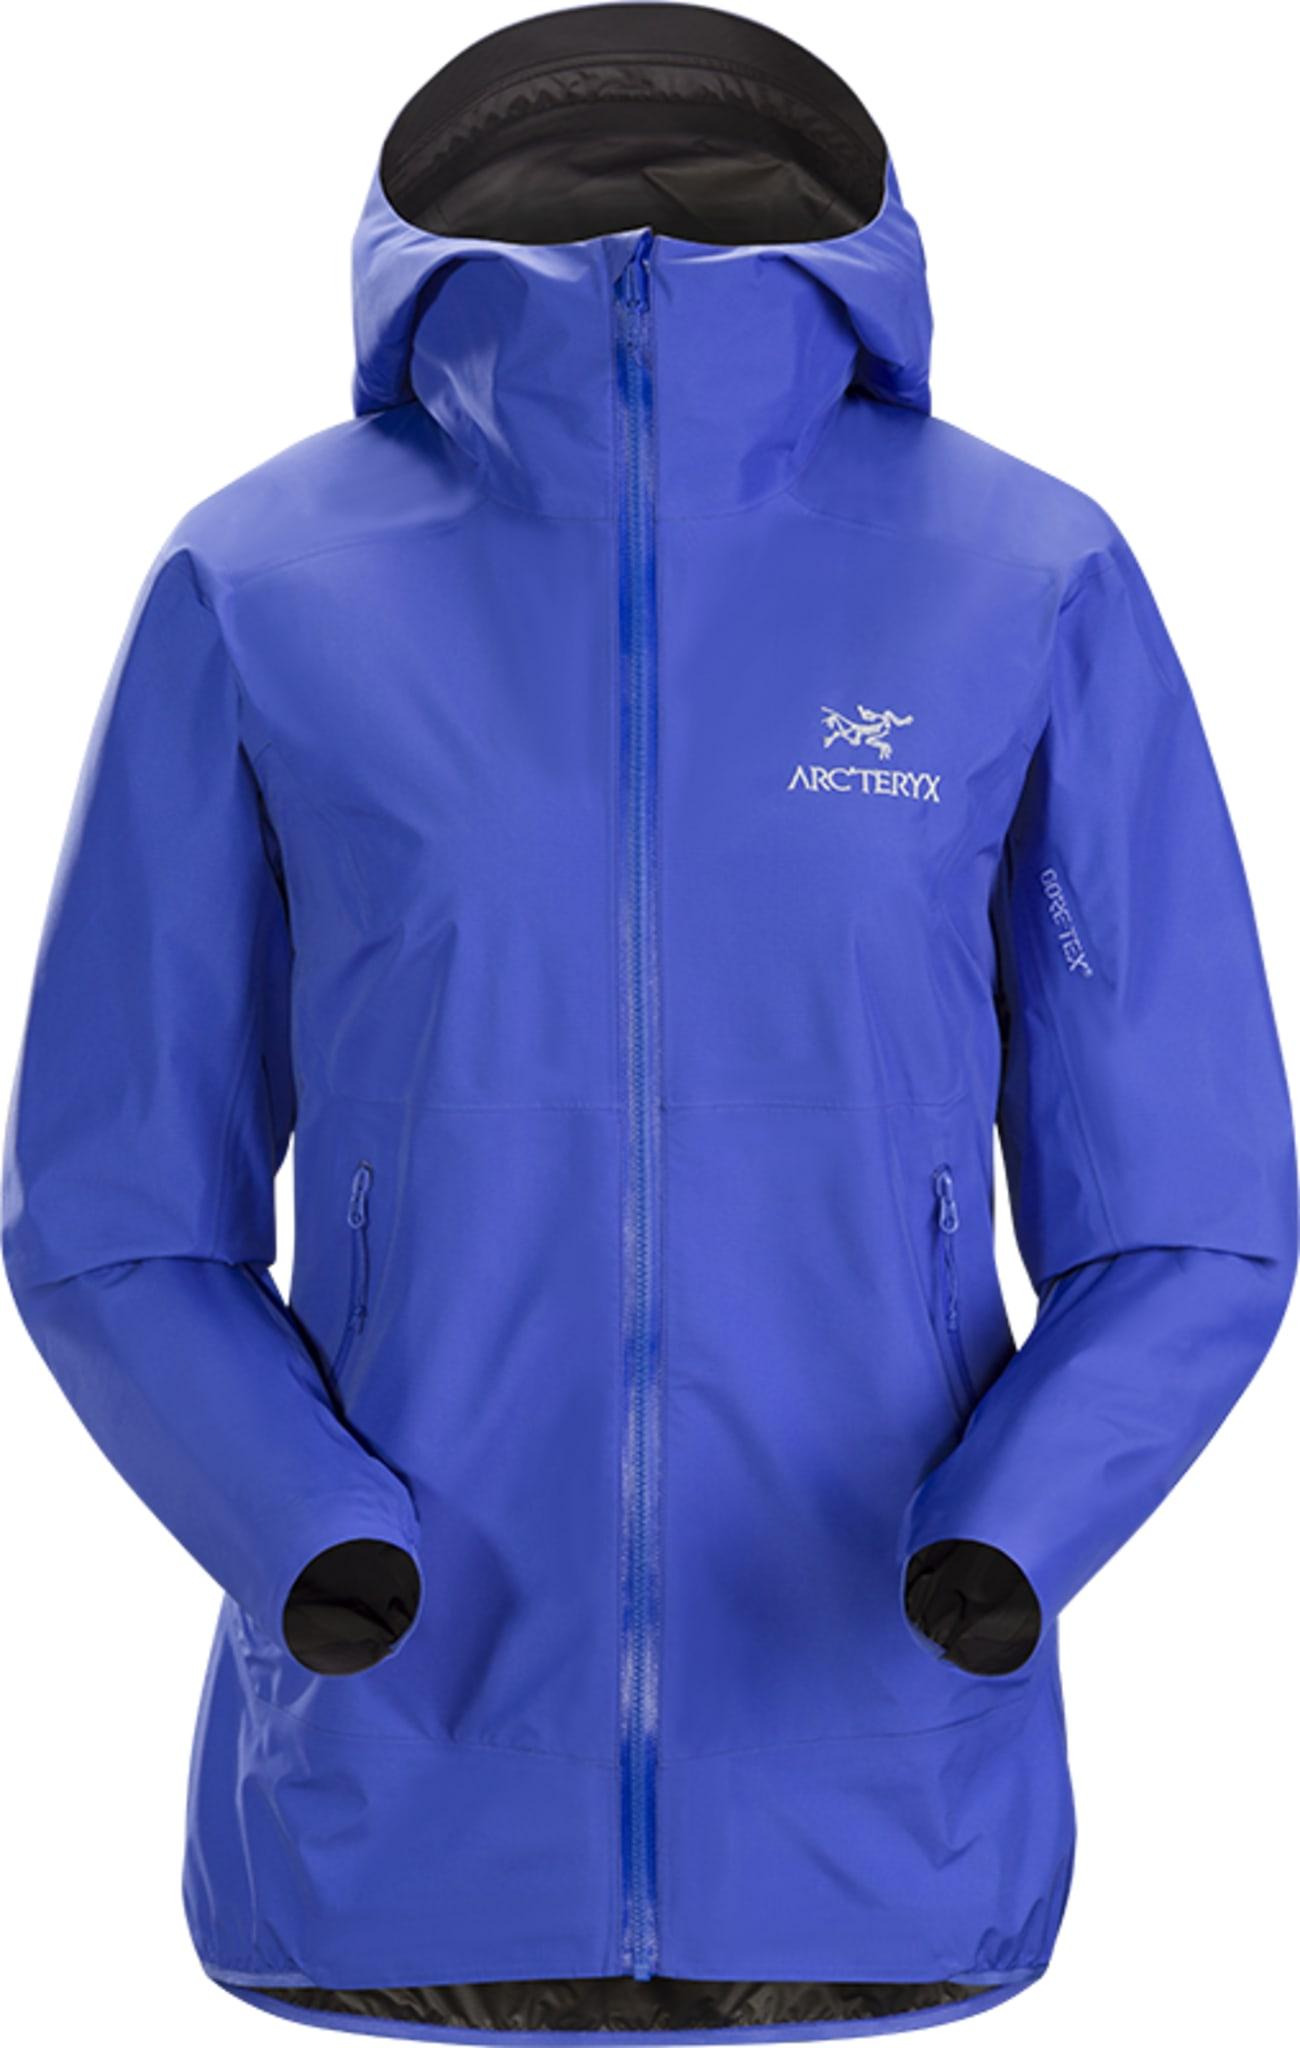 Zeta FL Jacket Ws